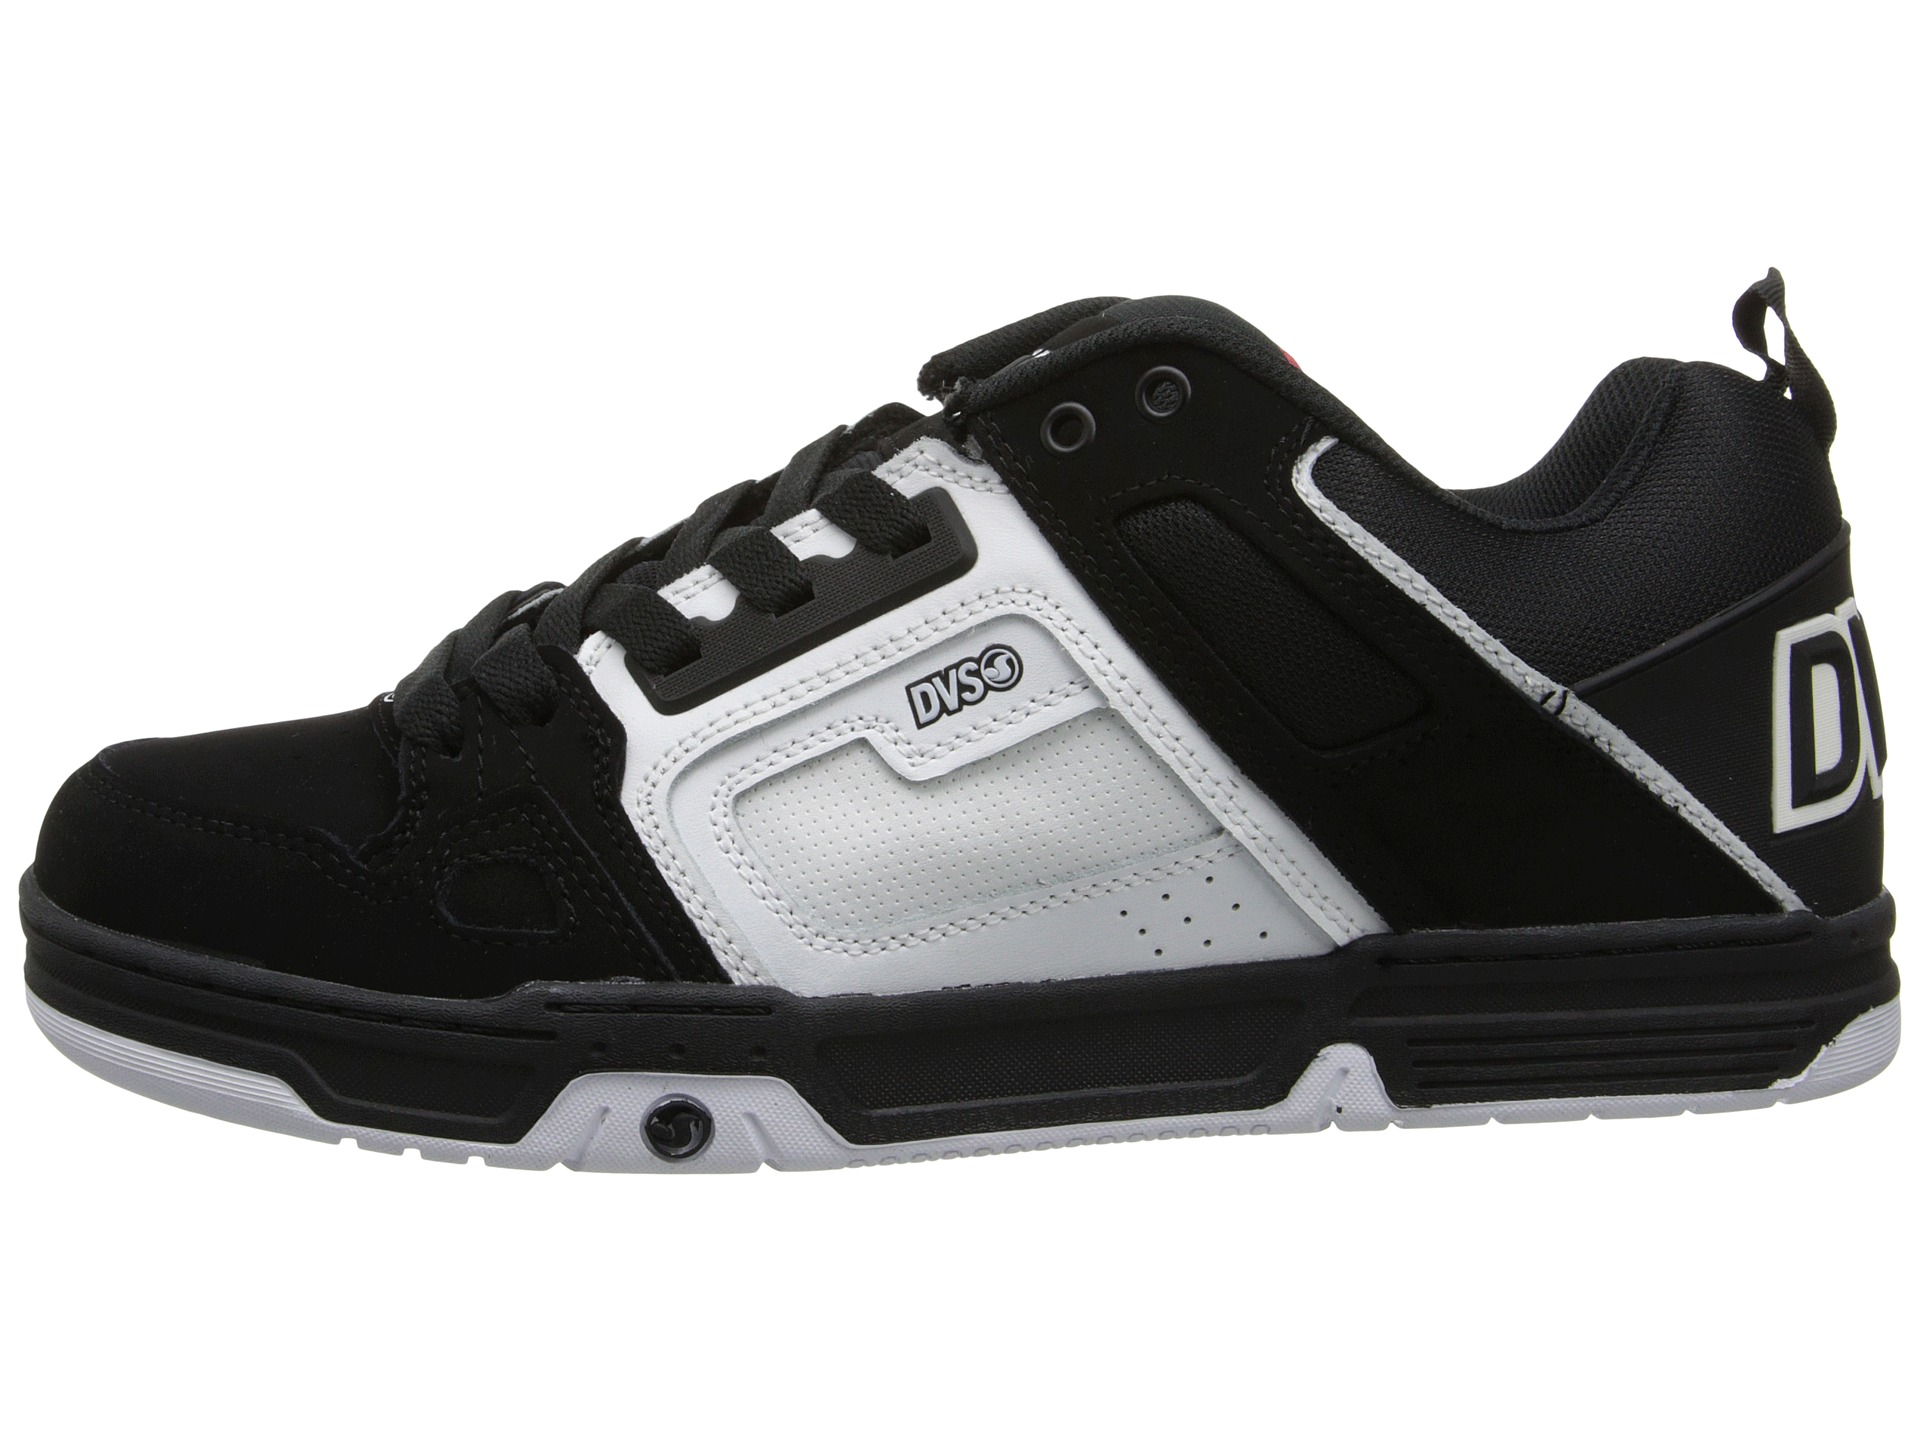 Kd Cupcake Shoes